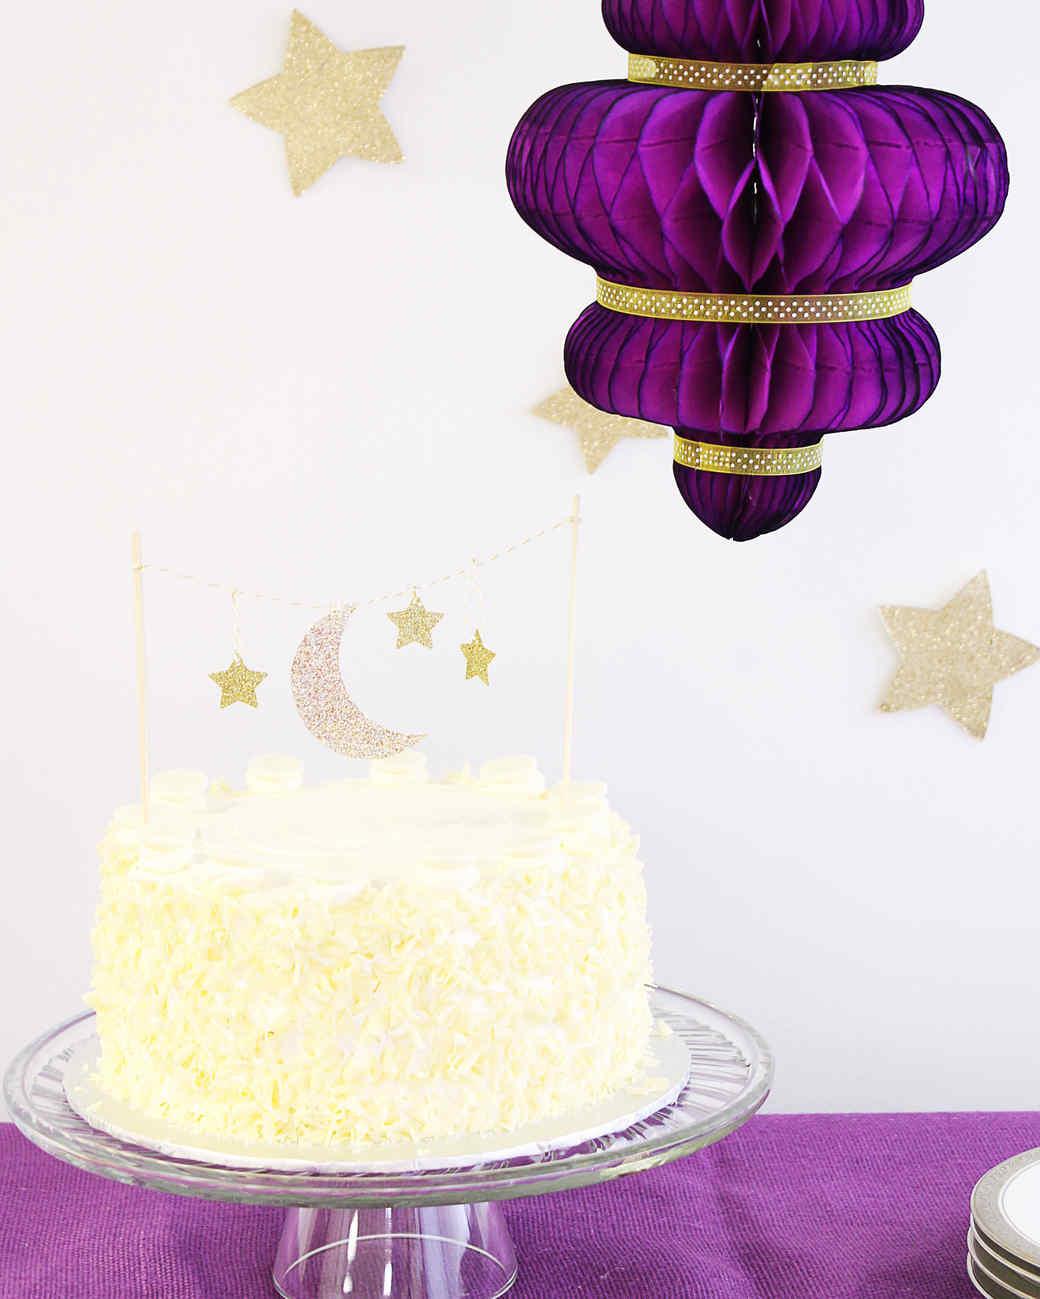 Wonderful Outdoor Eid Al-Fitr Decorations - eid-al-fitr-cake-topper-2-0617_vert  HD_797581 .jpg?itok\u003dzhzDeEwk